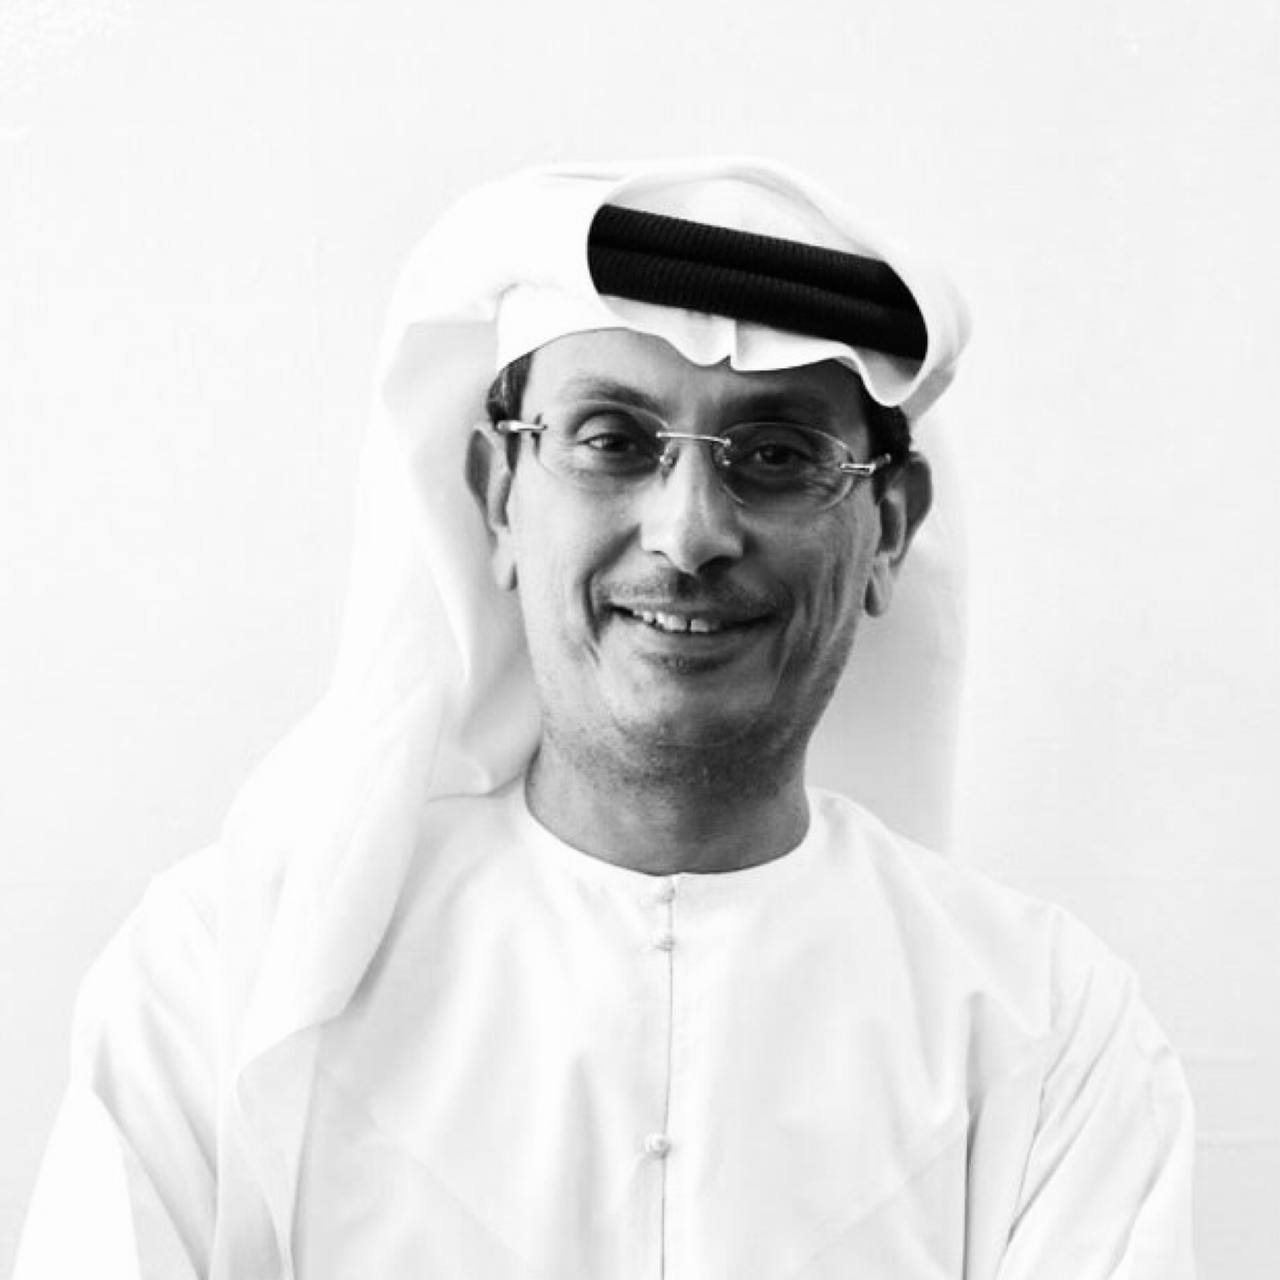 Mohammed Mahfoudh